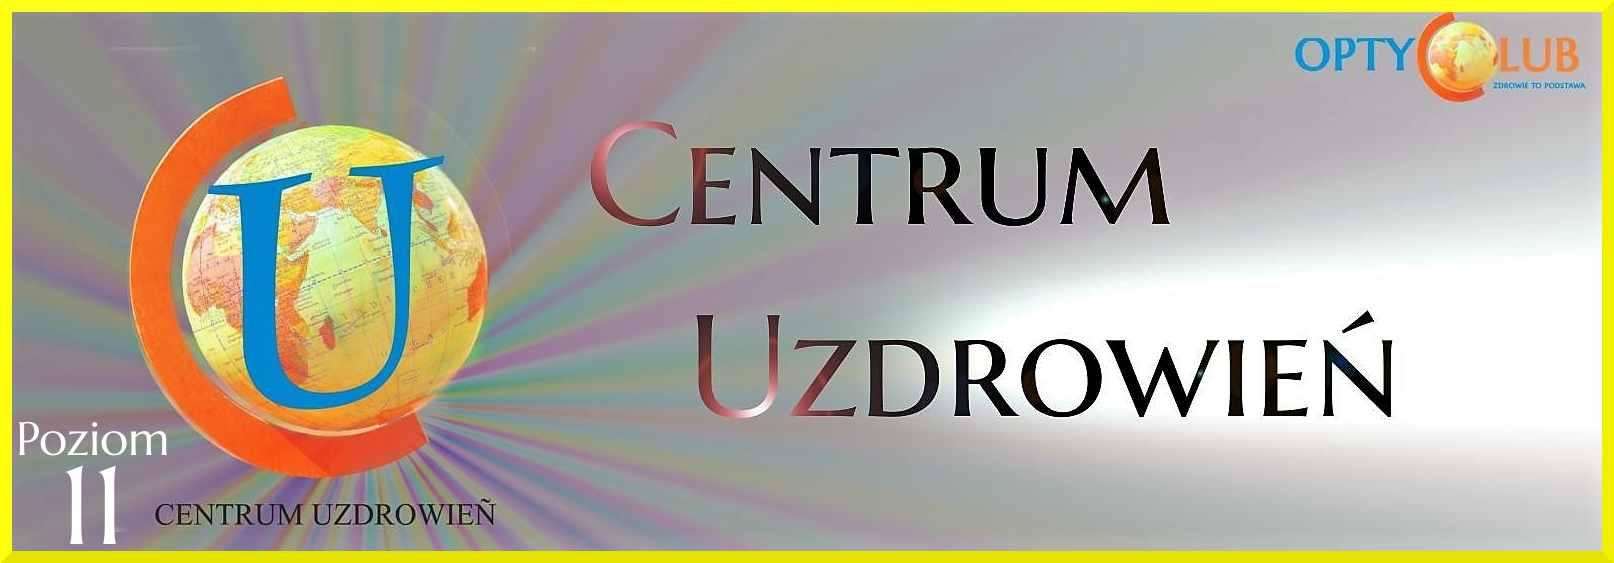 https://optyclub.pl/wp-content/uploads/2018/10/Poziom-11.-Centrum-uzdrowien-2.jpg